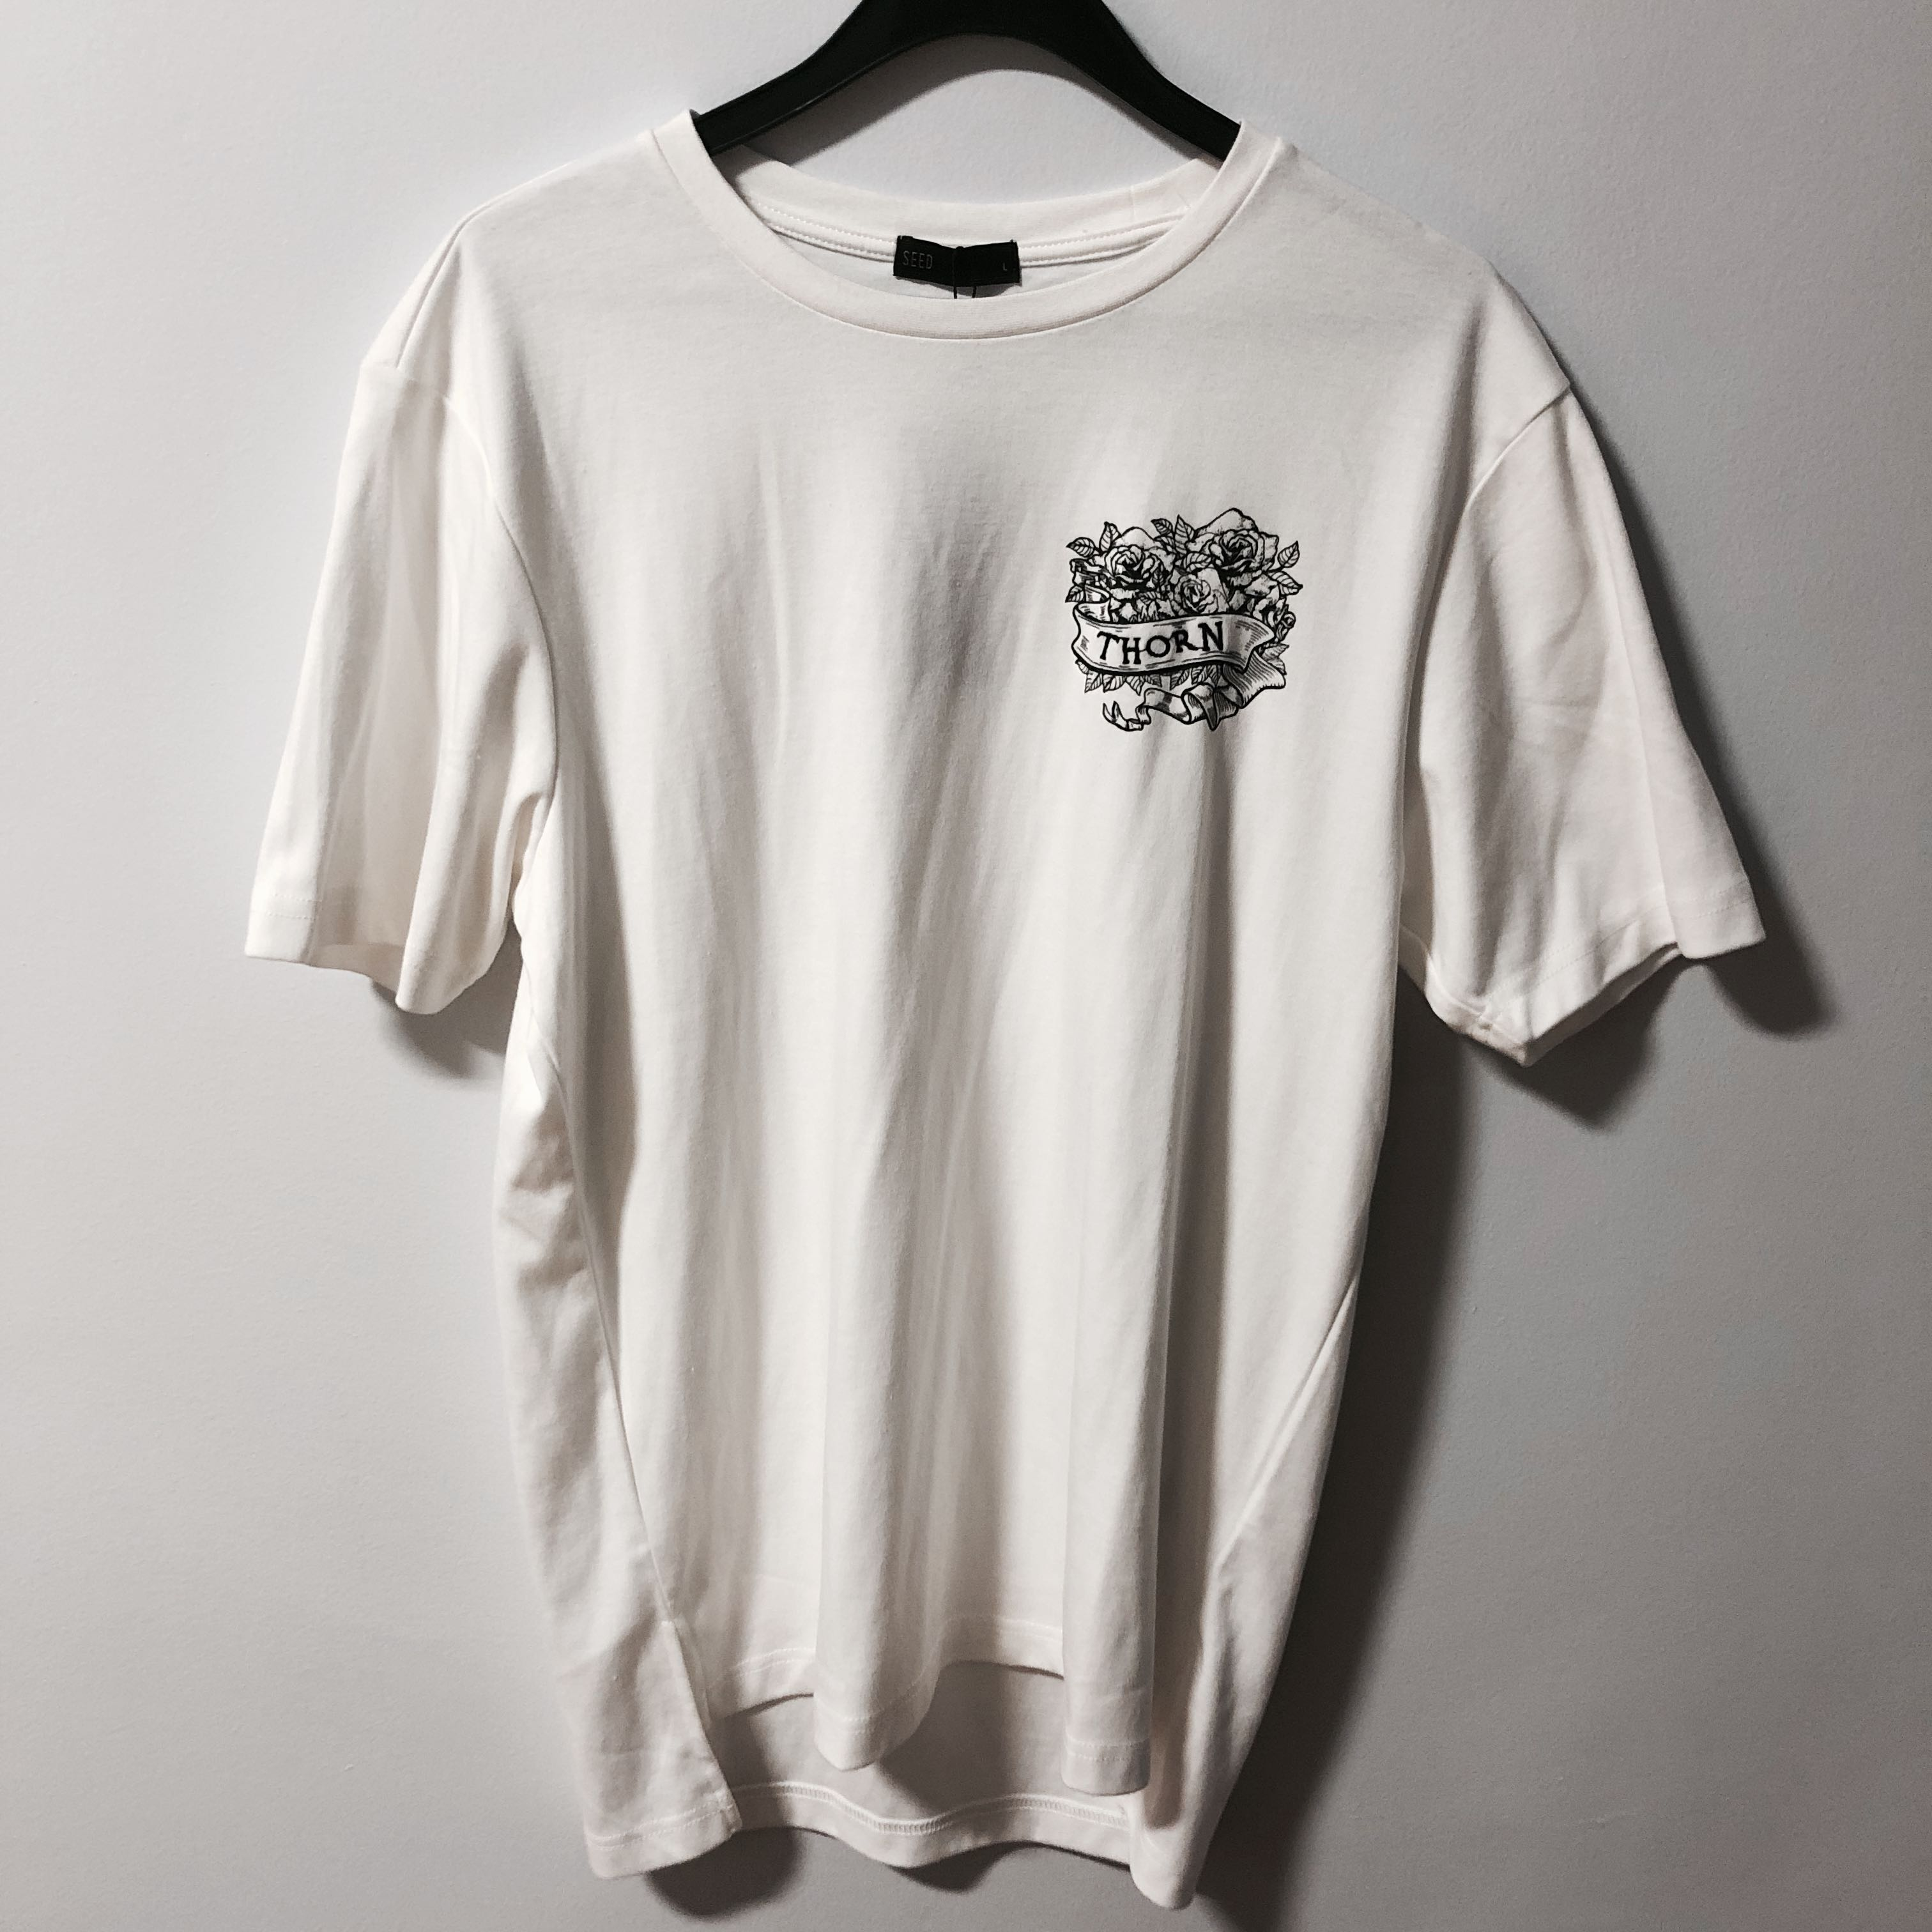 BNWT Seed Thorn T-shirt